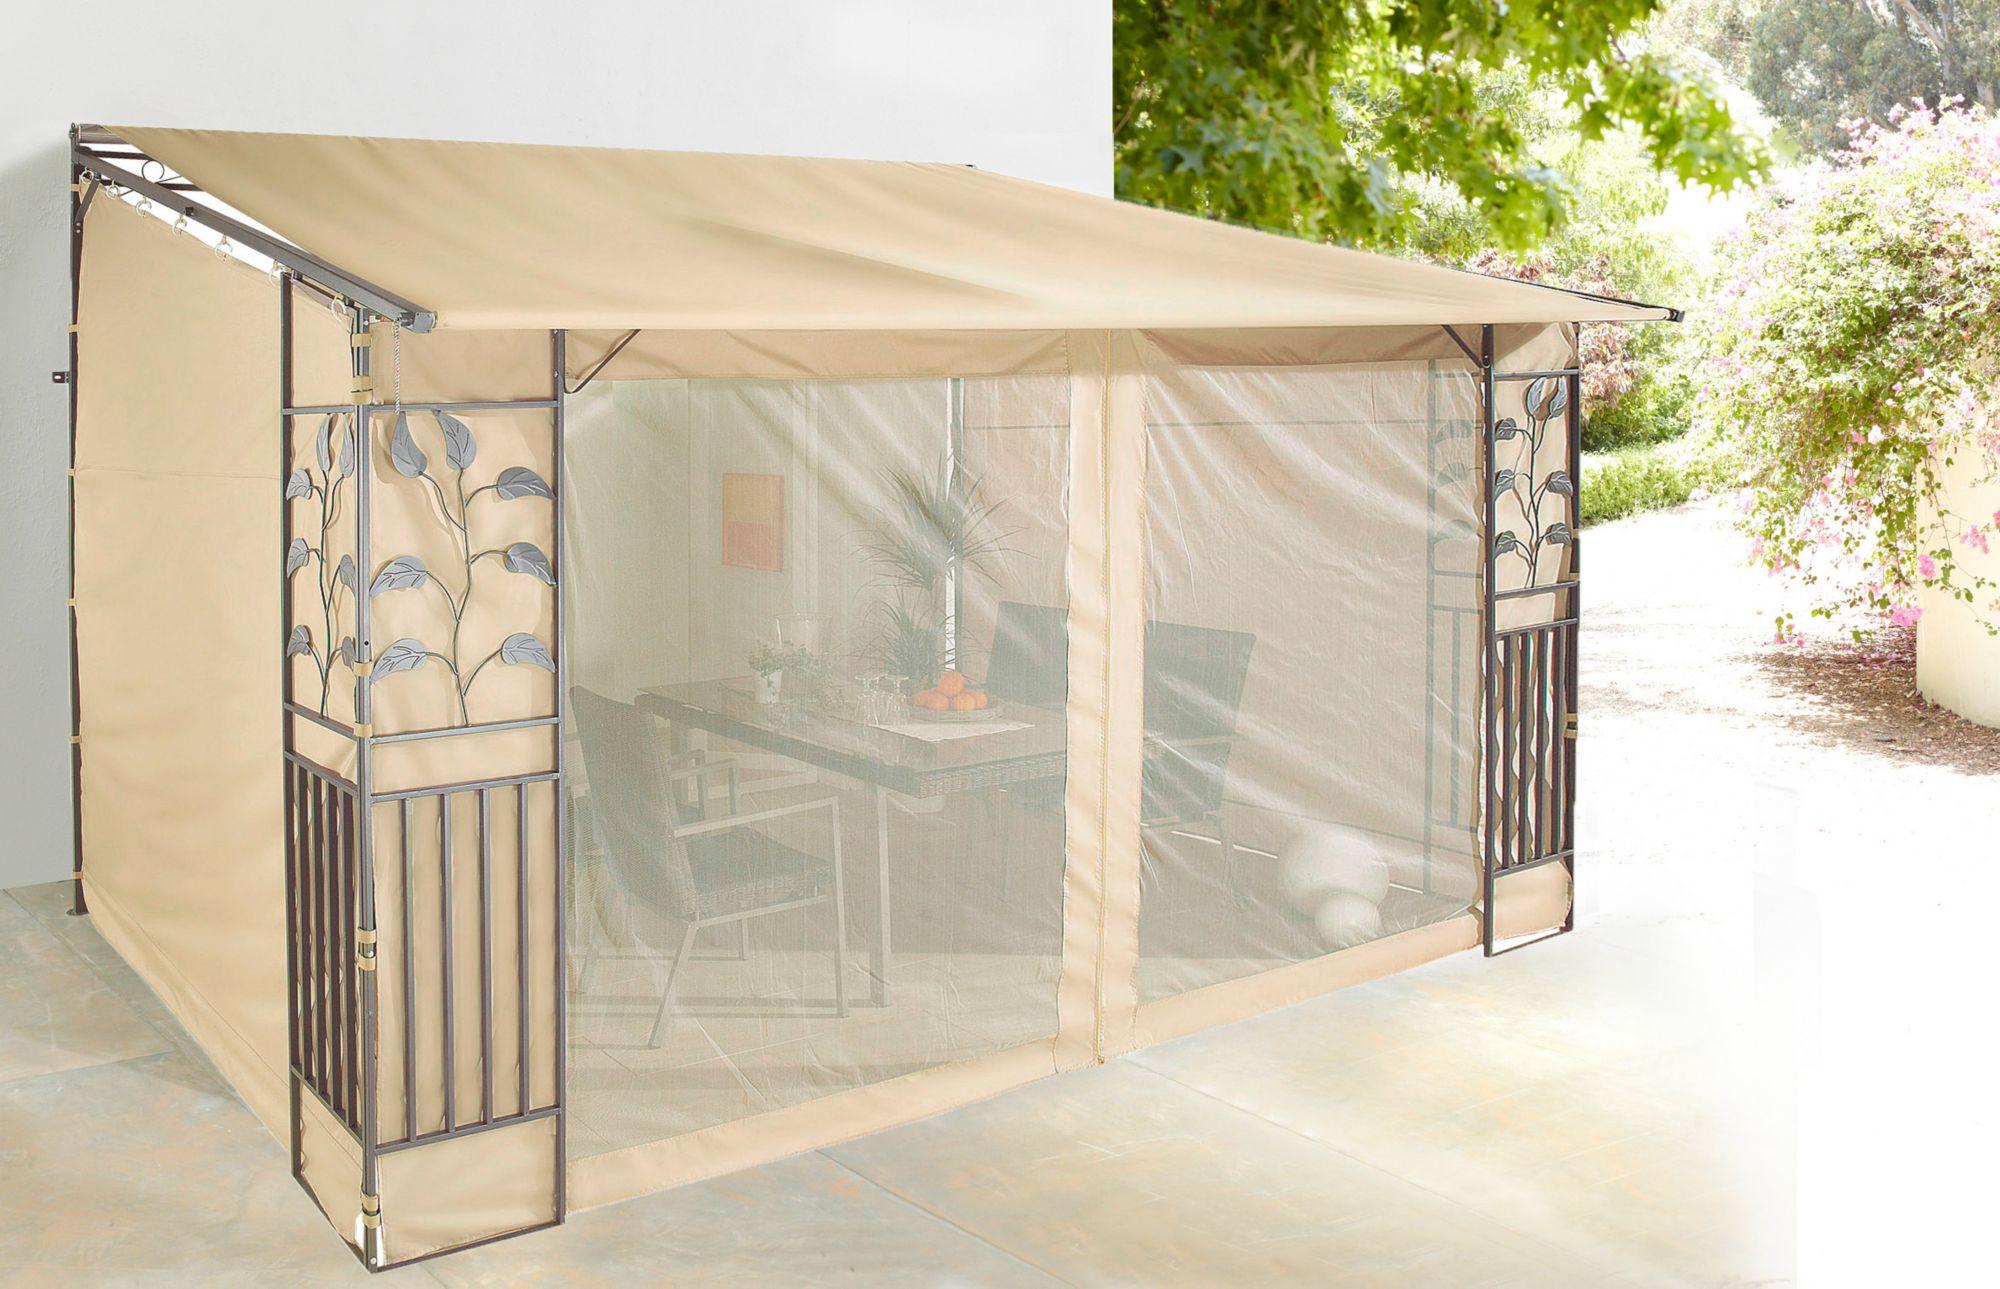 seitenteile f r pavillon rollpavillon sandfarben. Black Bedroom Furniture Sets. Home Design Ideas